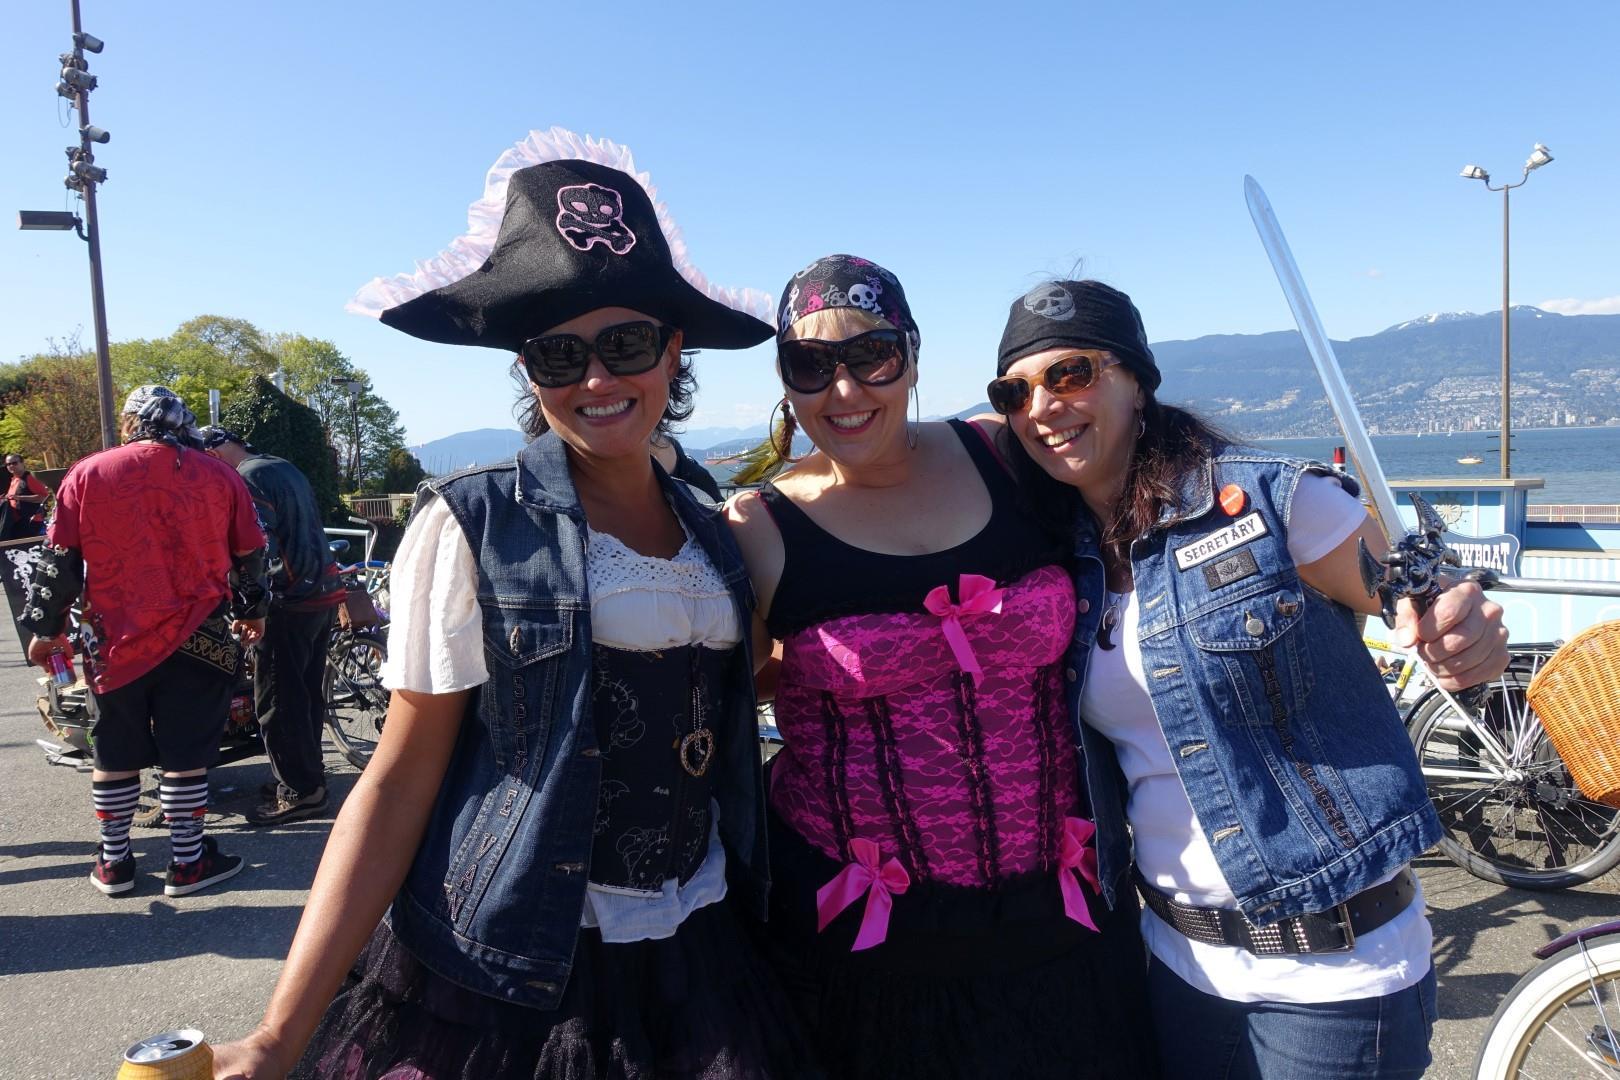 SVW Pirate Ride